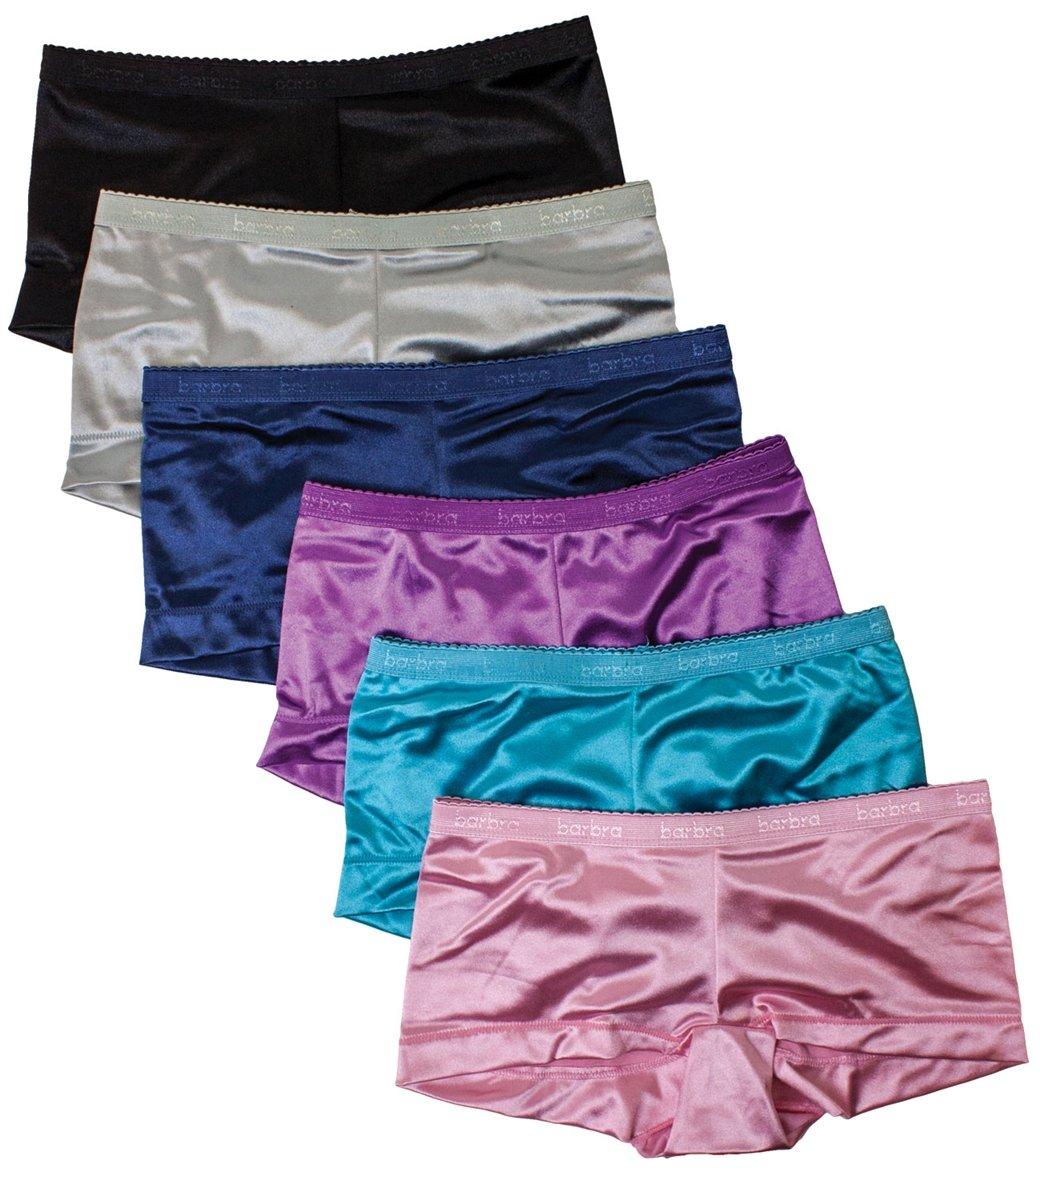 Barbra 6 pack Women's Satin Full Coverage Guaranteed Fit Boyshort Panties(3XL) by Barbra Lingerie (Image #2)